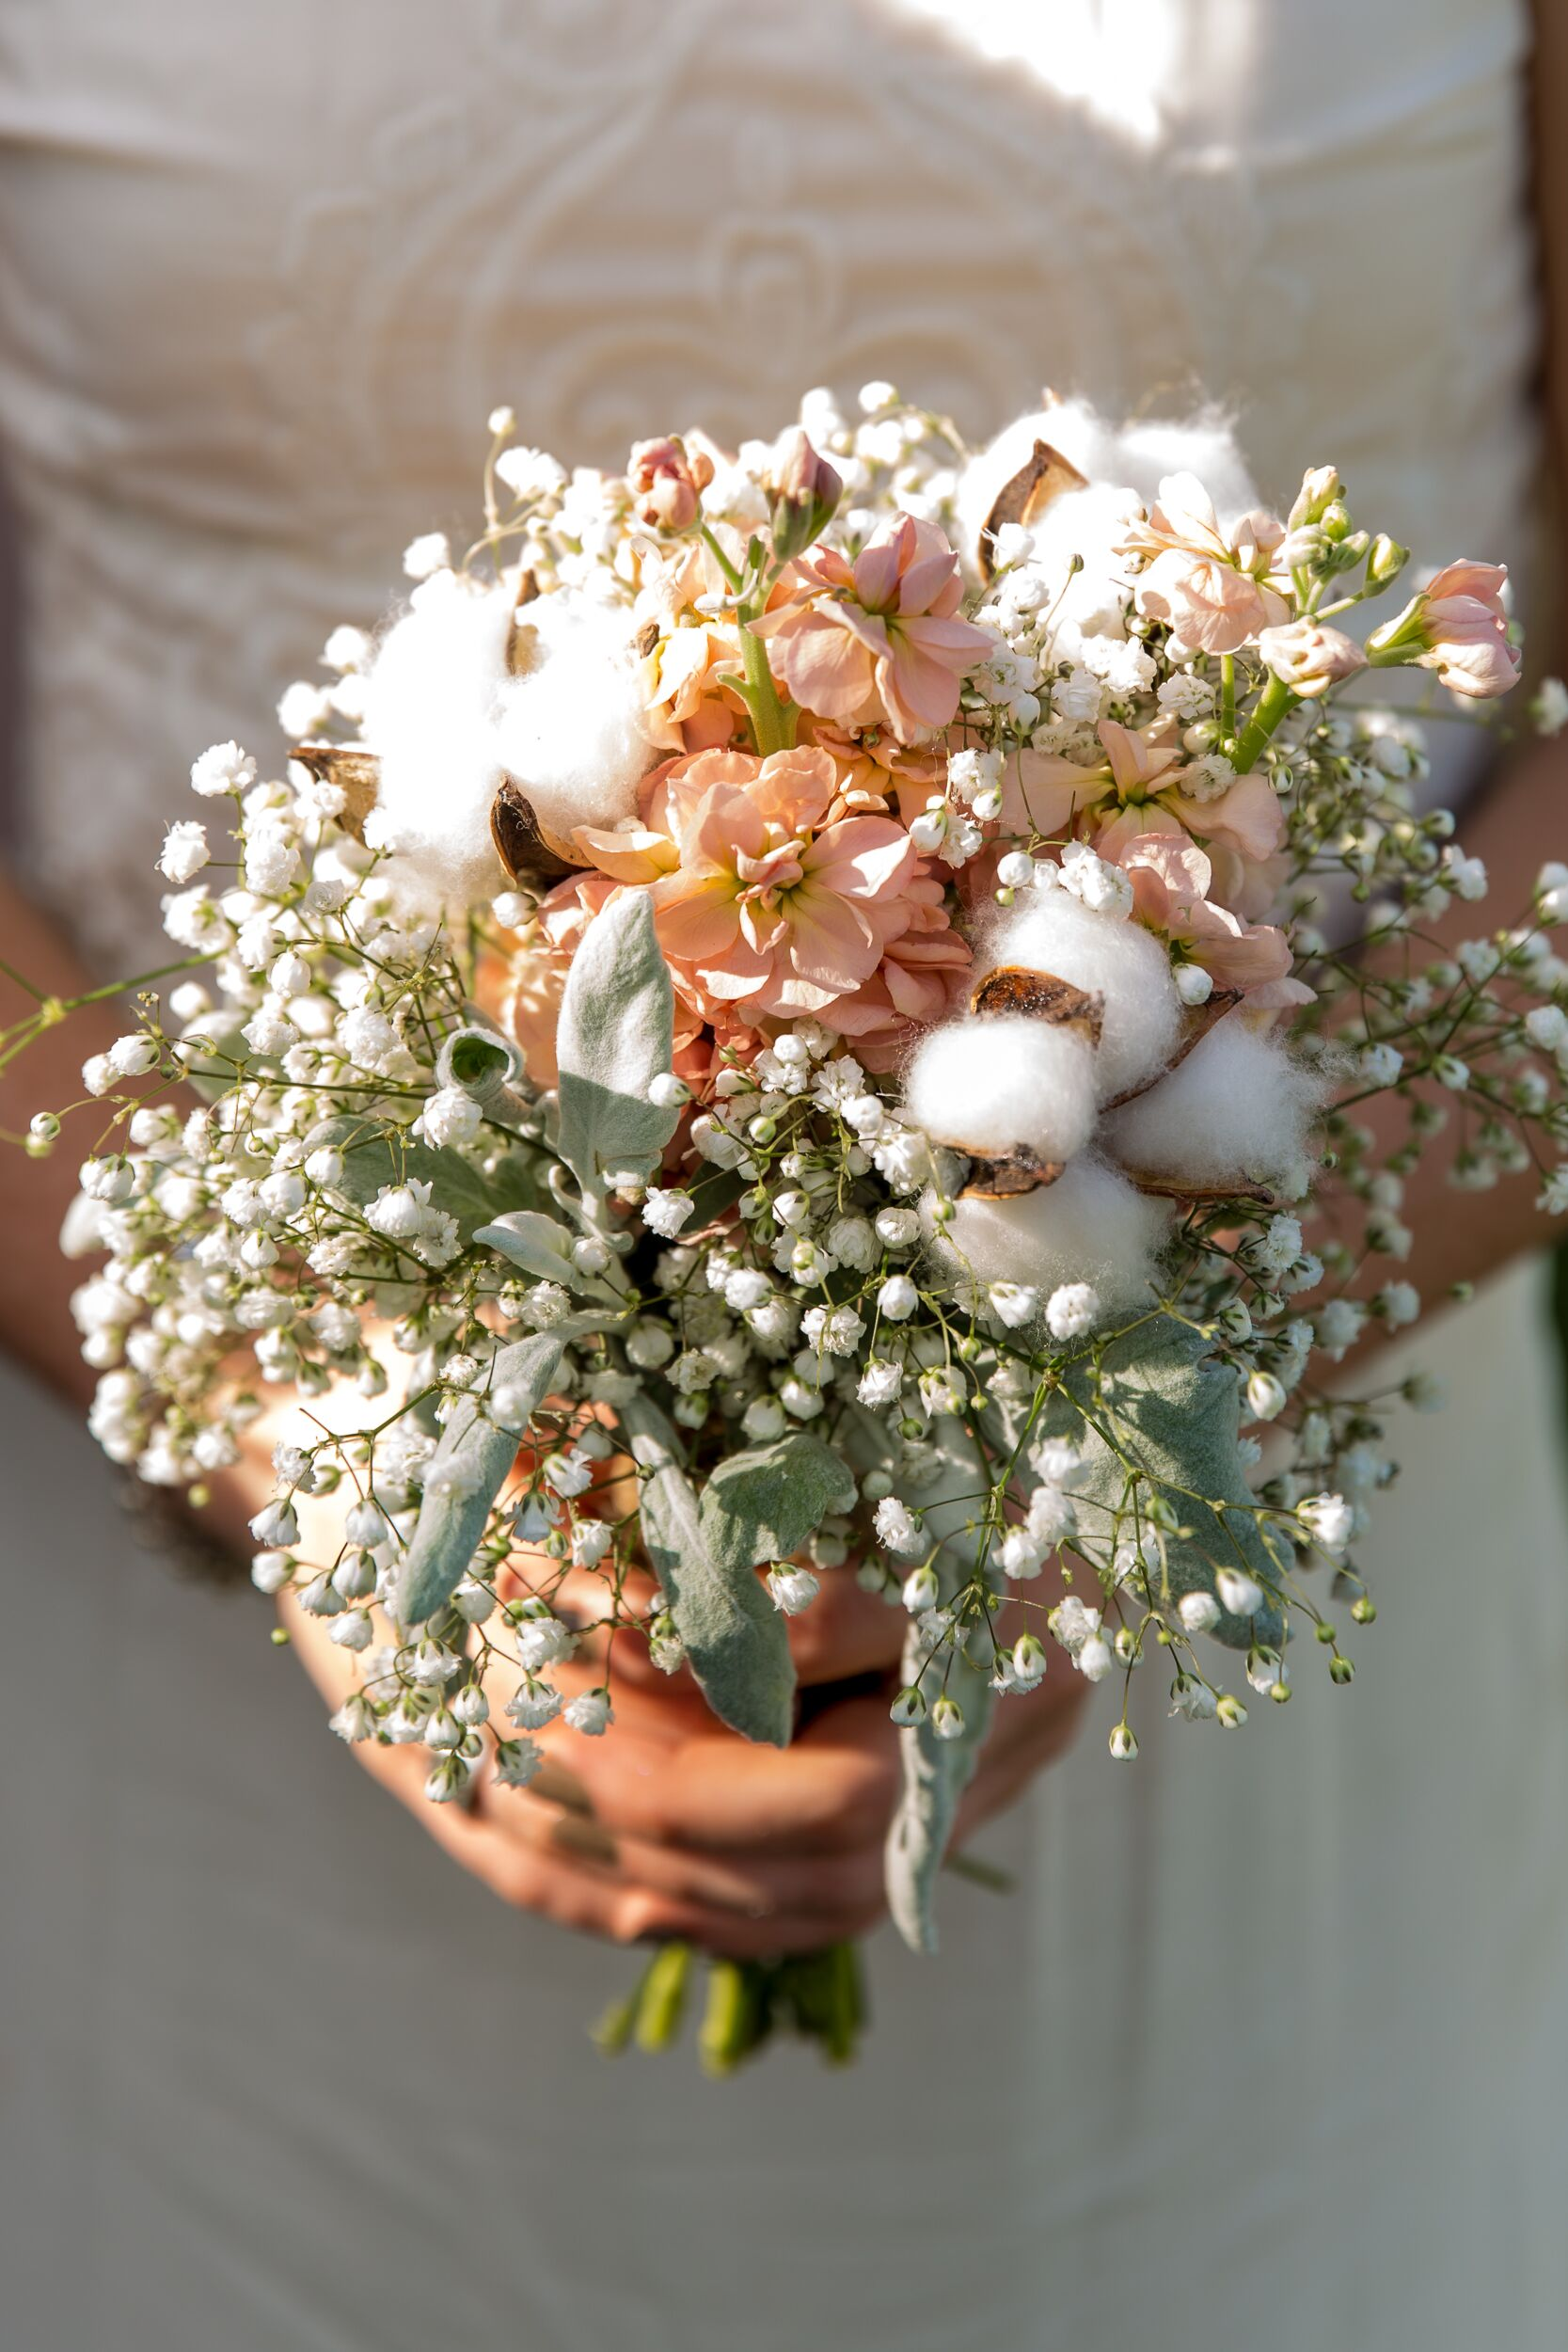 Rustic Cotton and Baby's Breath Bridesmaid Bouquets